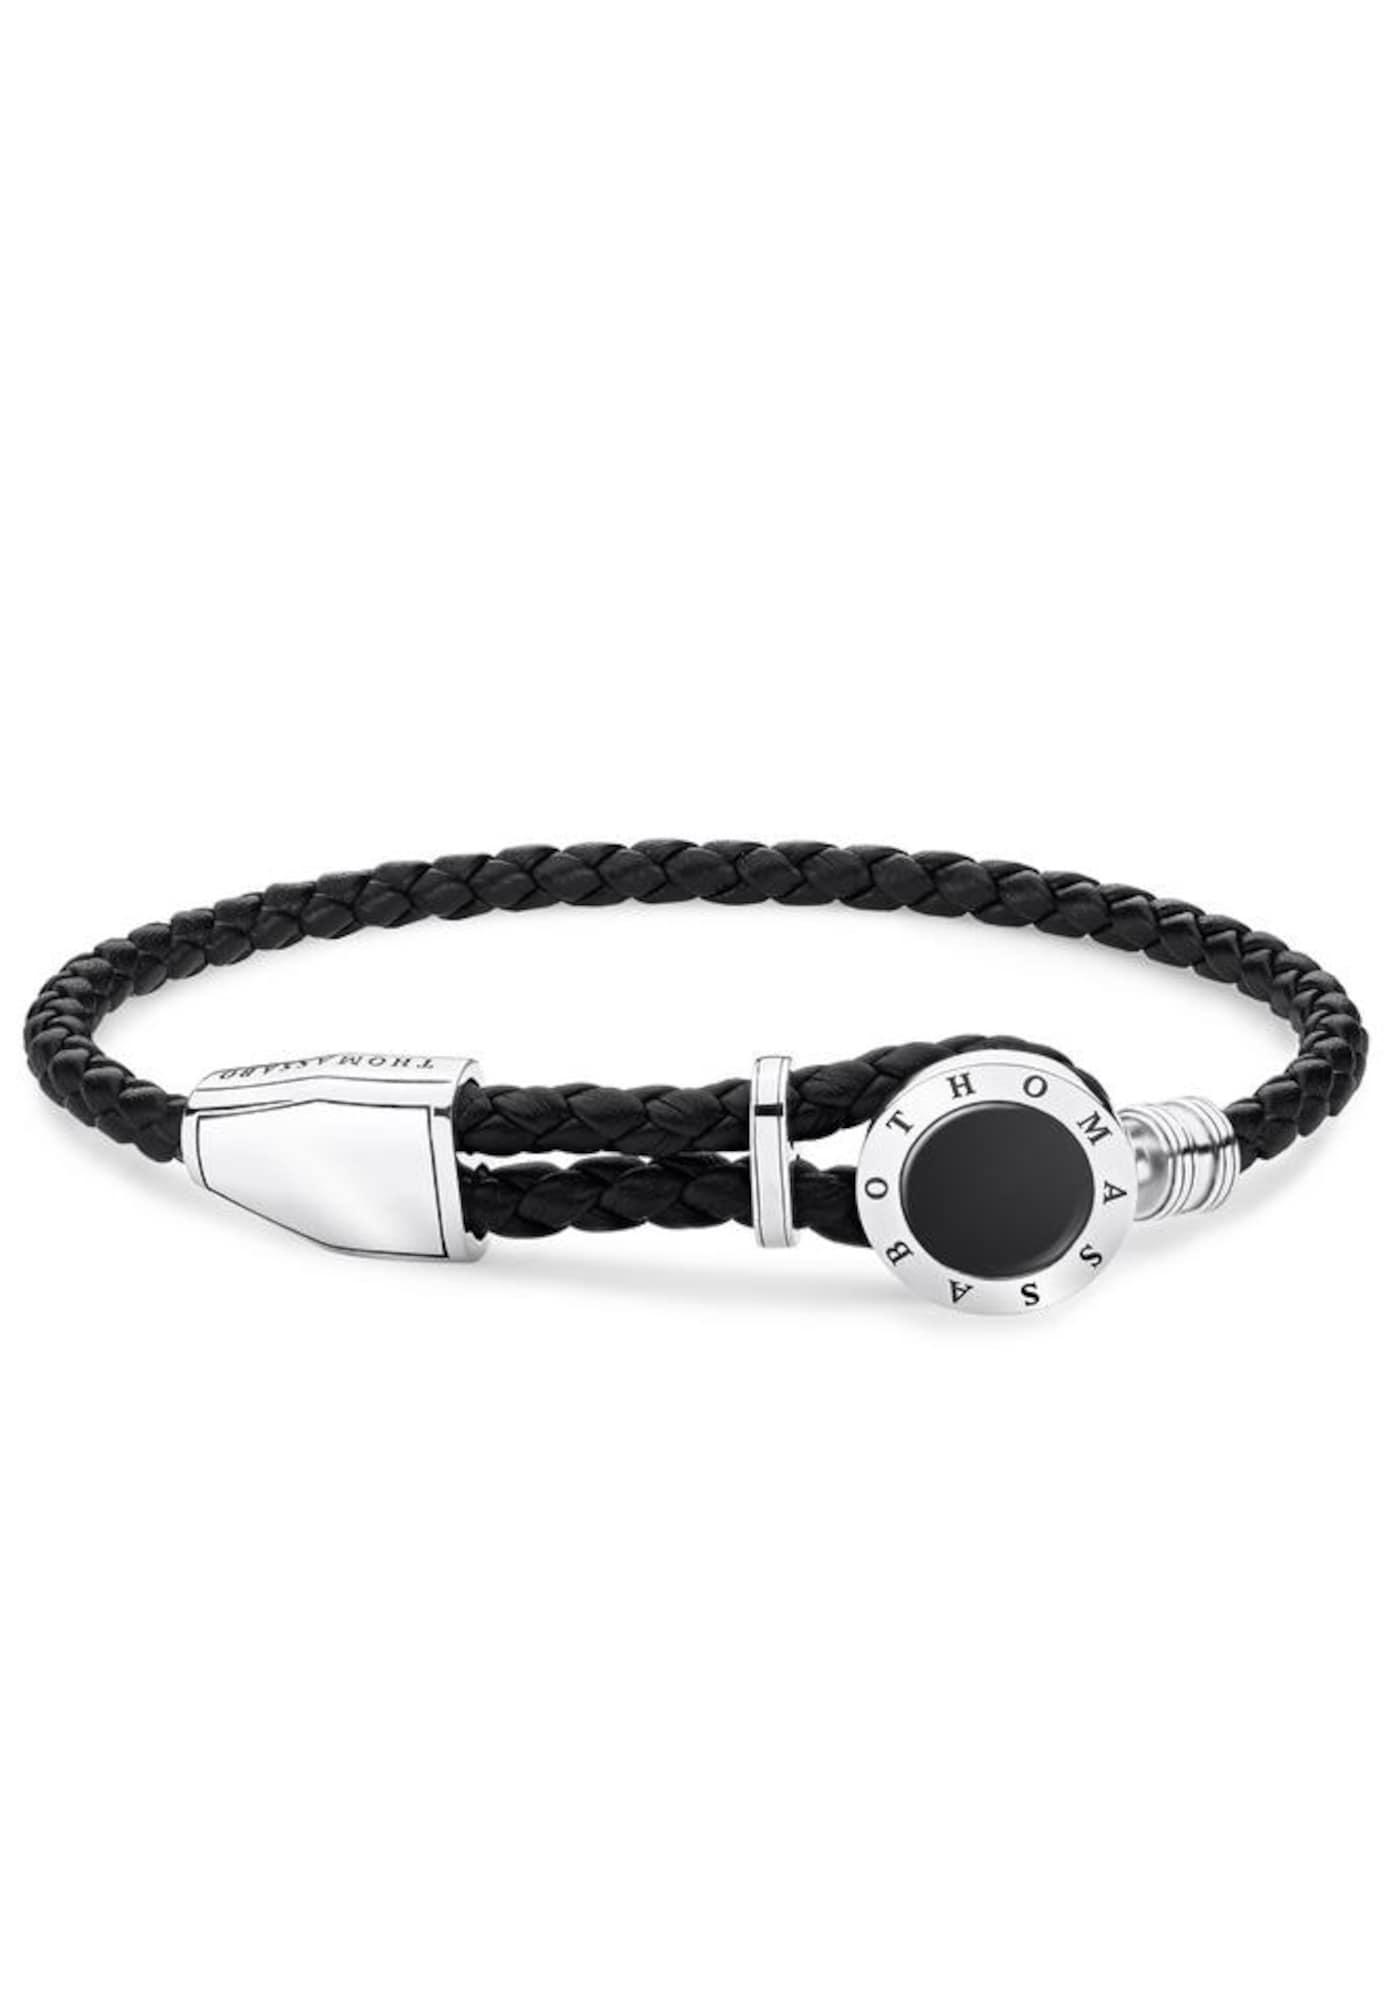 Armband 'Coin, A1864-982-11-L25v'   Schmuck > Armbänder > Sonstige Armbänder   Schwarz - Silber   Thomas Sabo